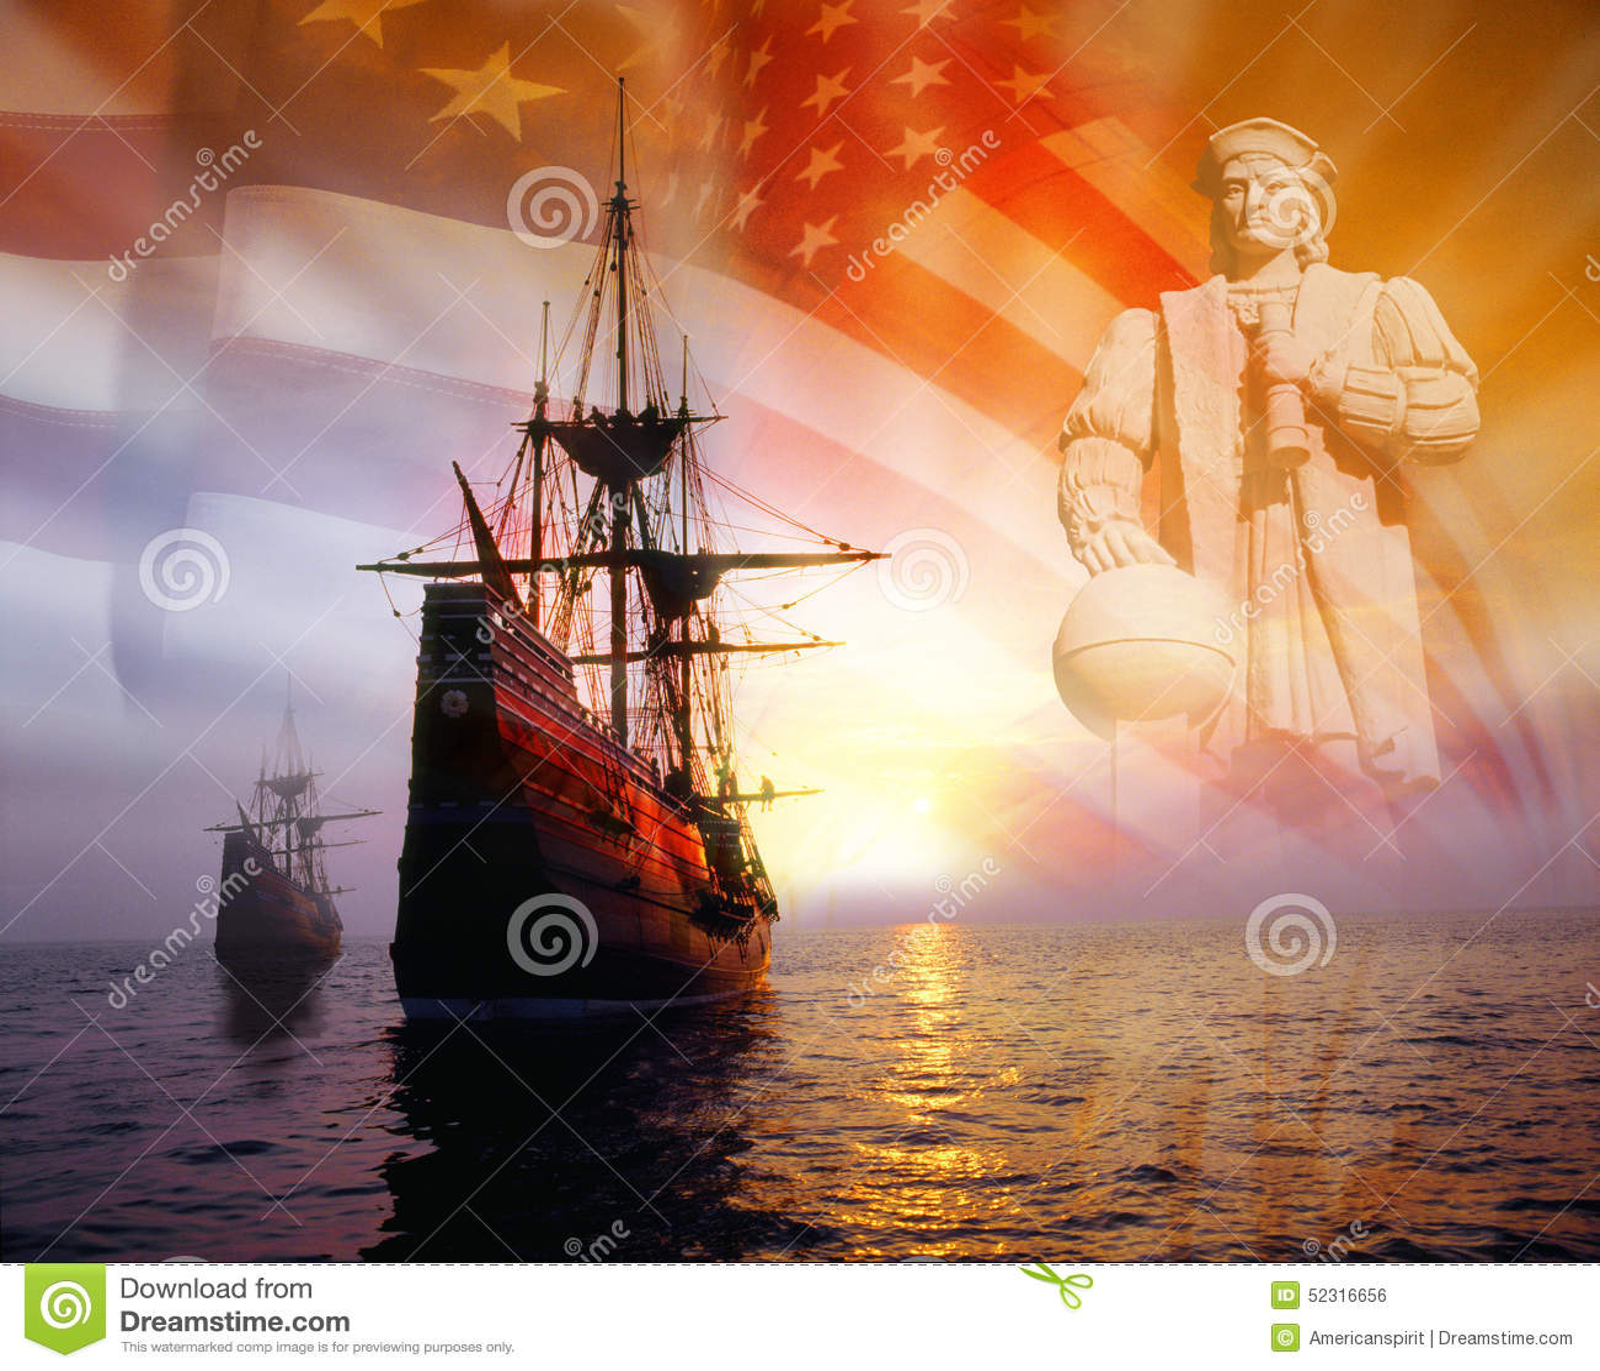 photo montage christopher columbus american flag sailing ships